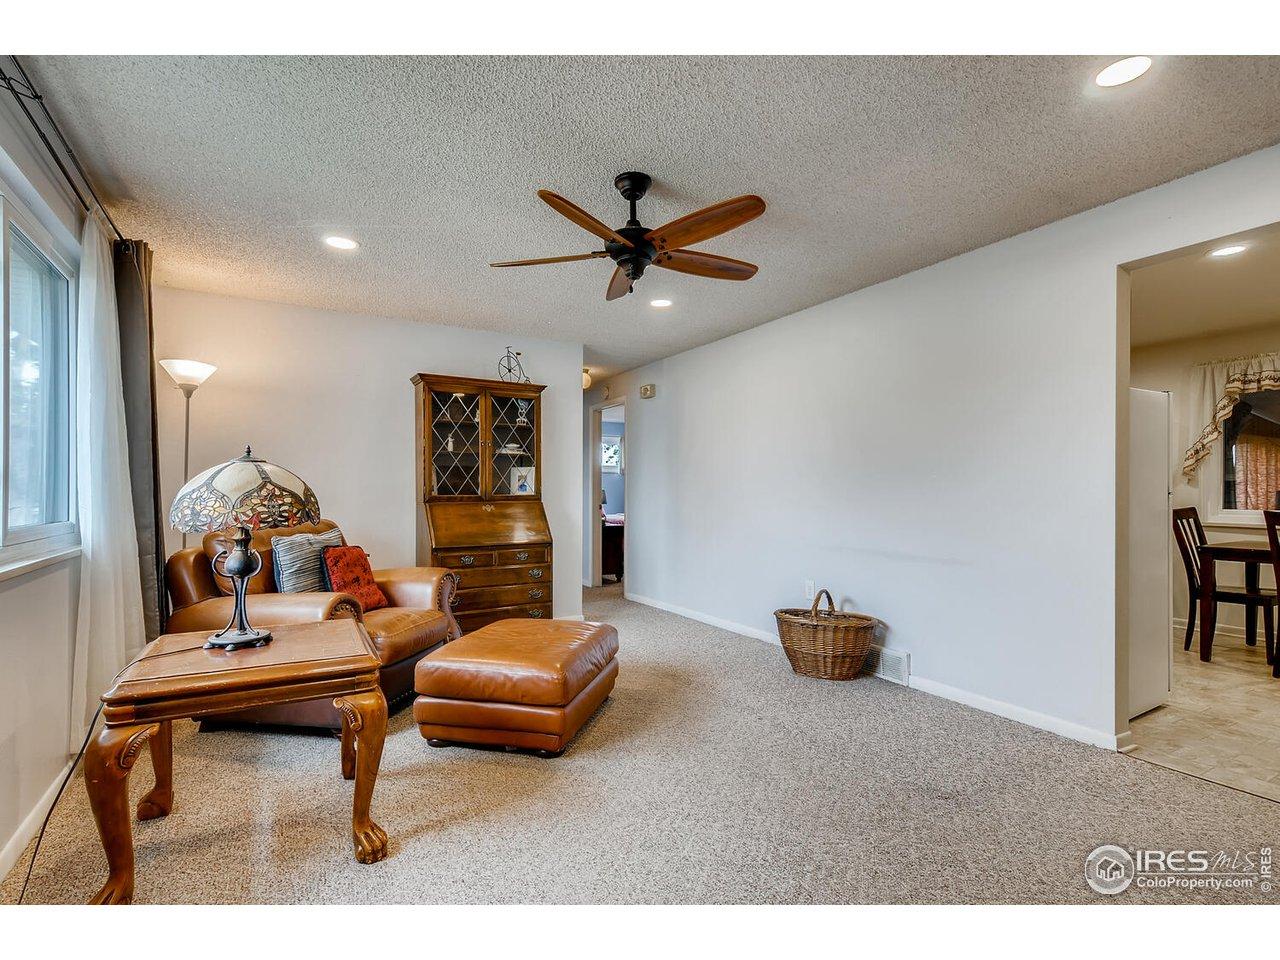 Enclosed sunroom w/ fireplace